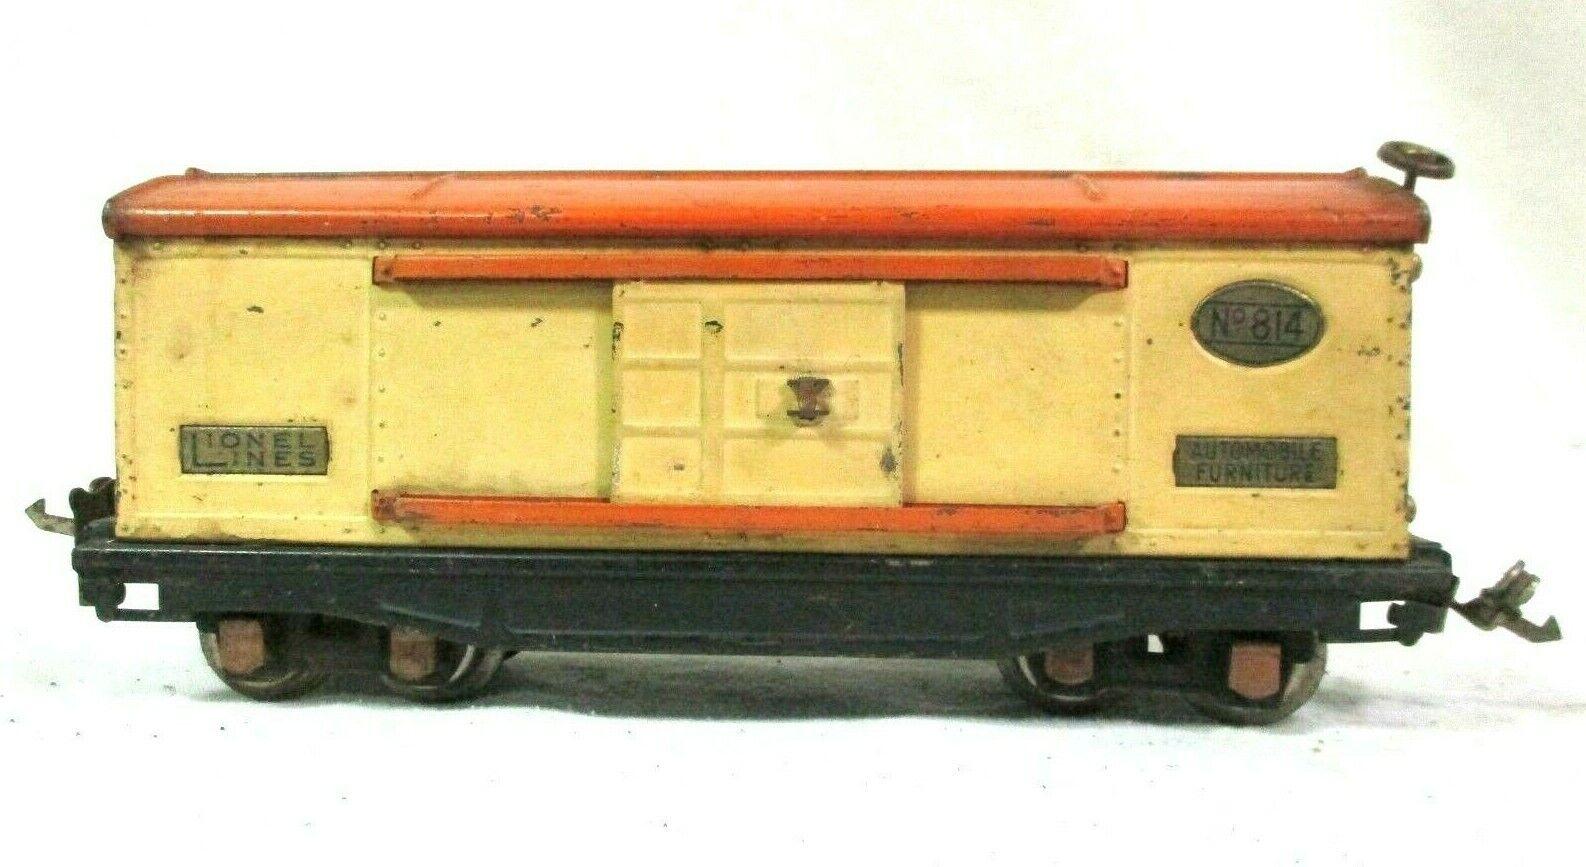 Lionel Furniture Boxcar in Cream orange Pre War Vintage Model Railway B54